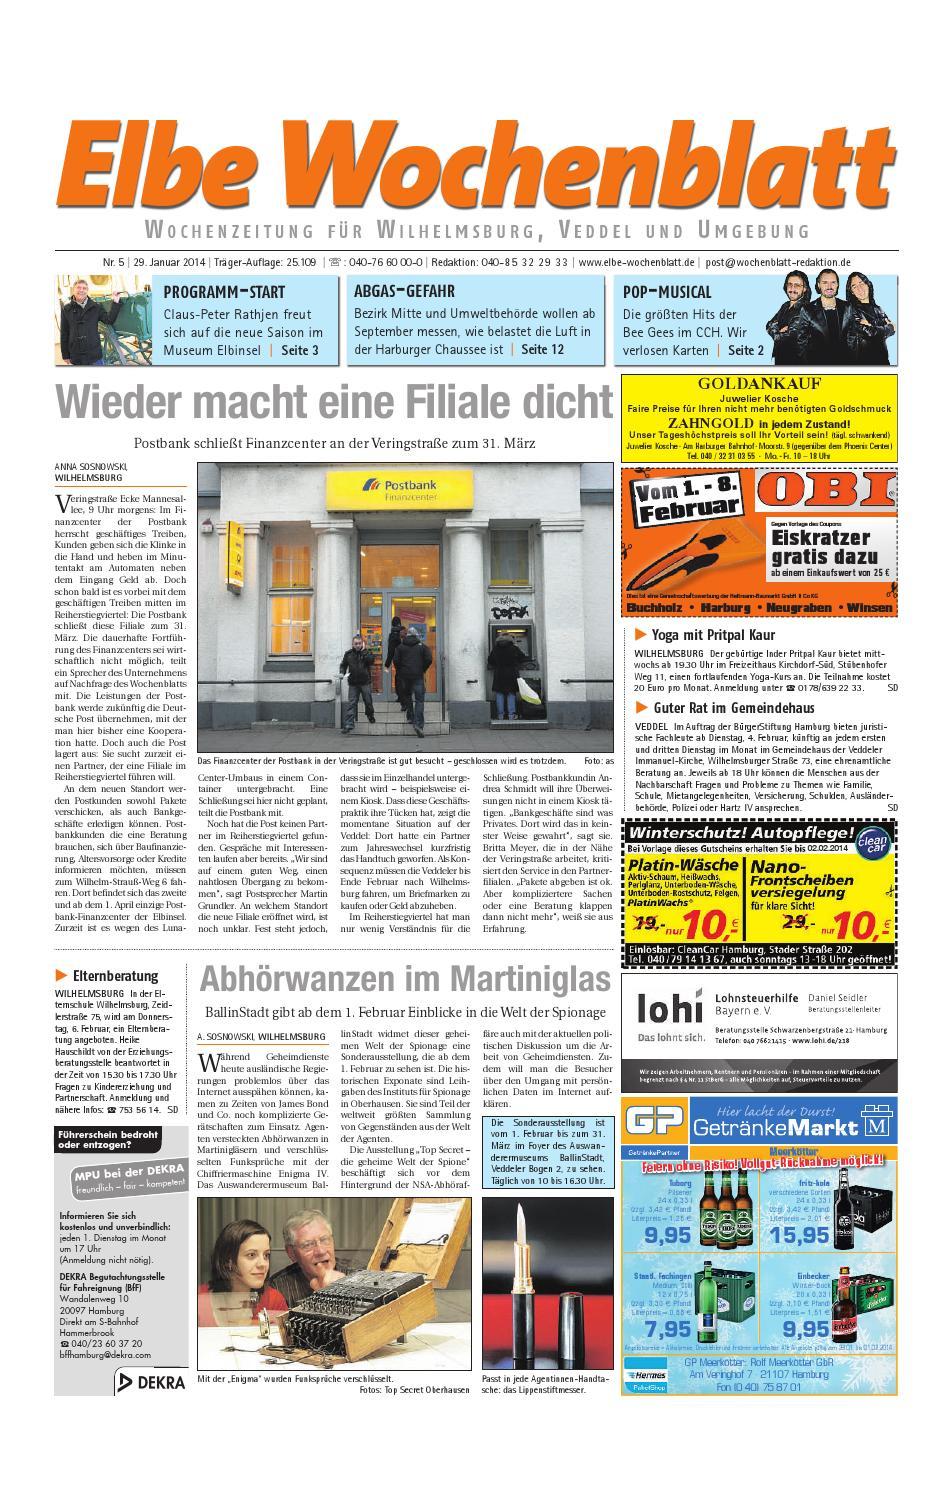 Wilhelmsburg KW05-2014 by Elbe Wochenblatt Verlagsgesellschaft mbH & Co.KG  - issuu